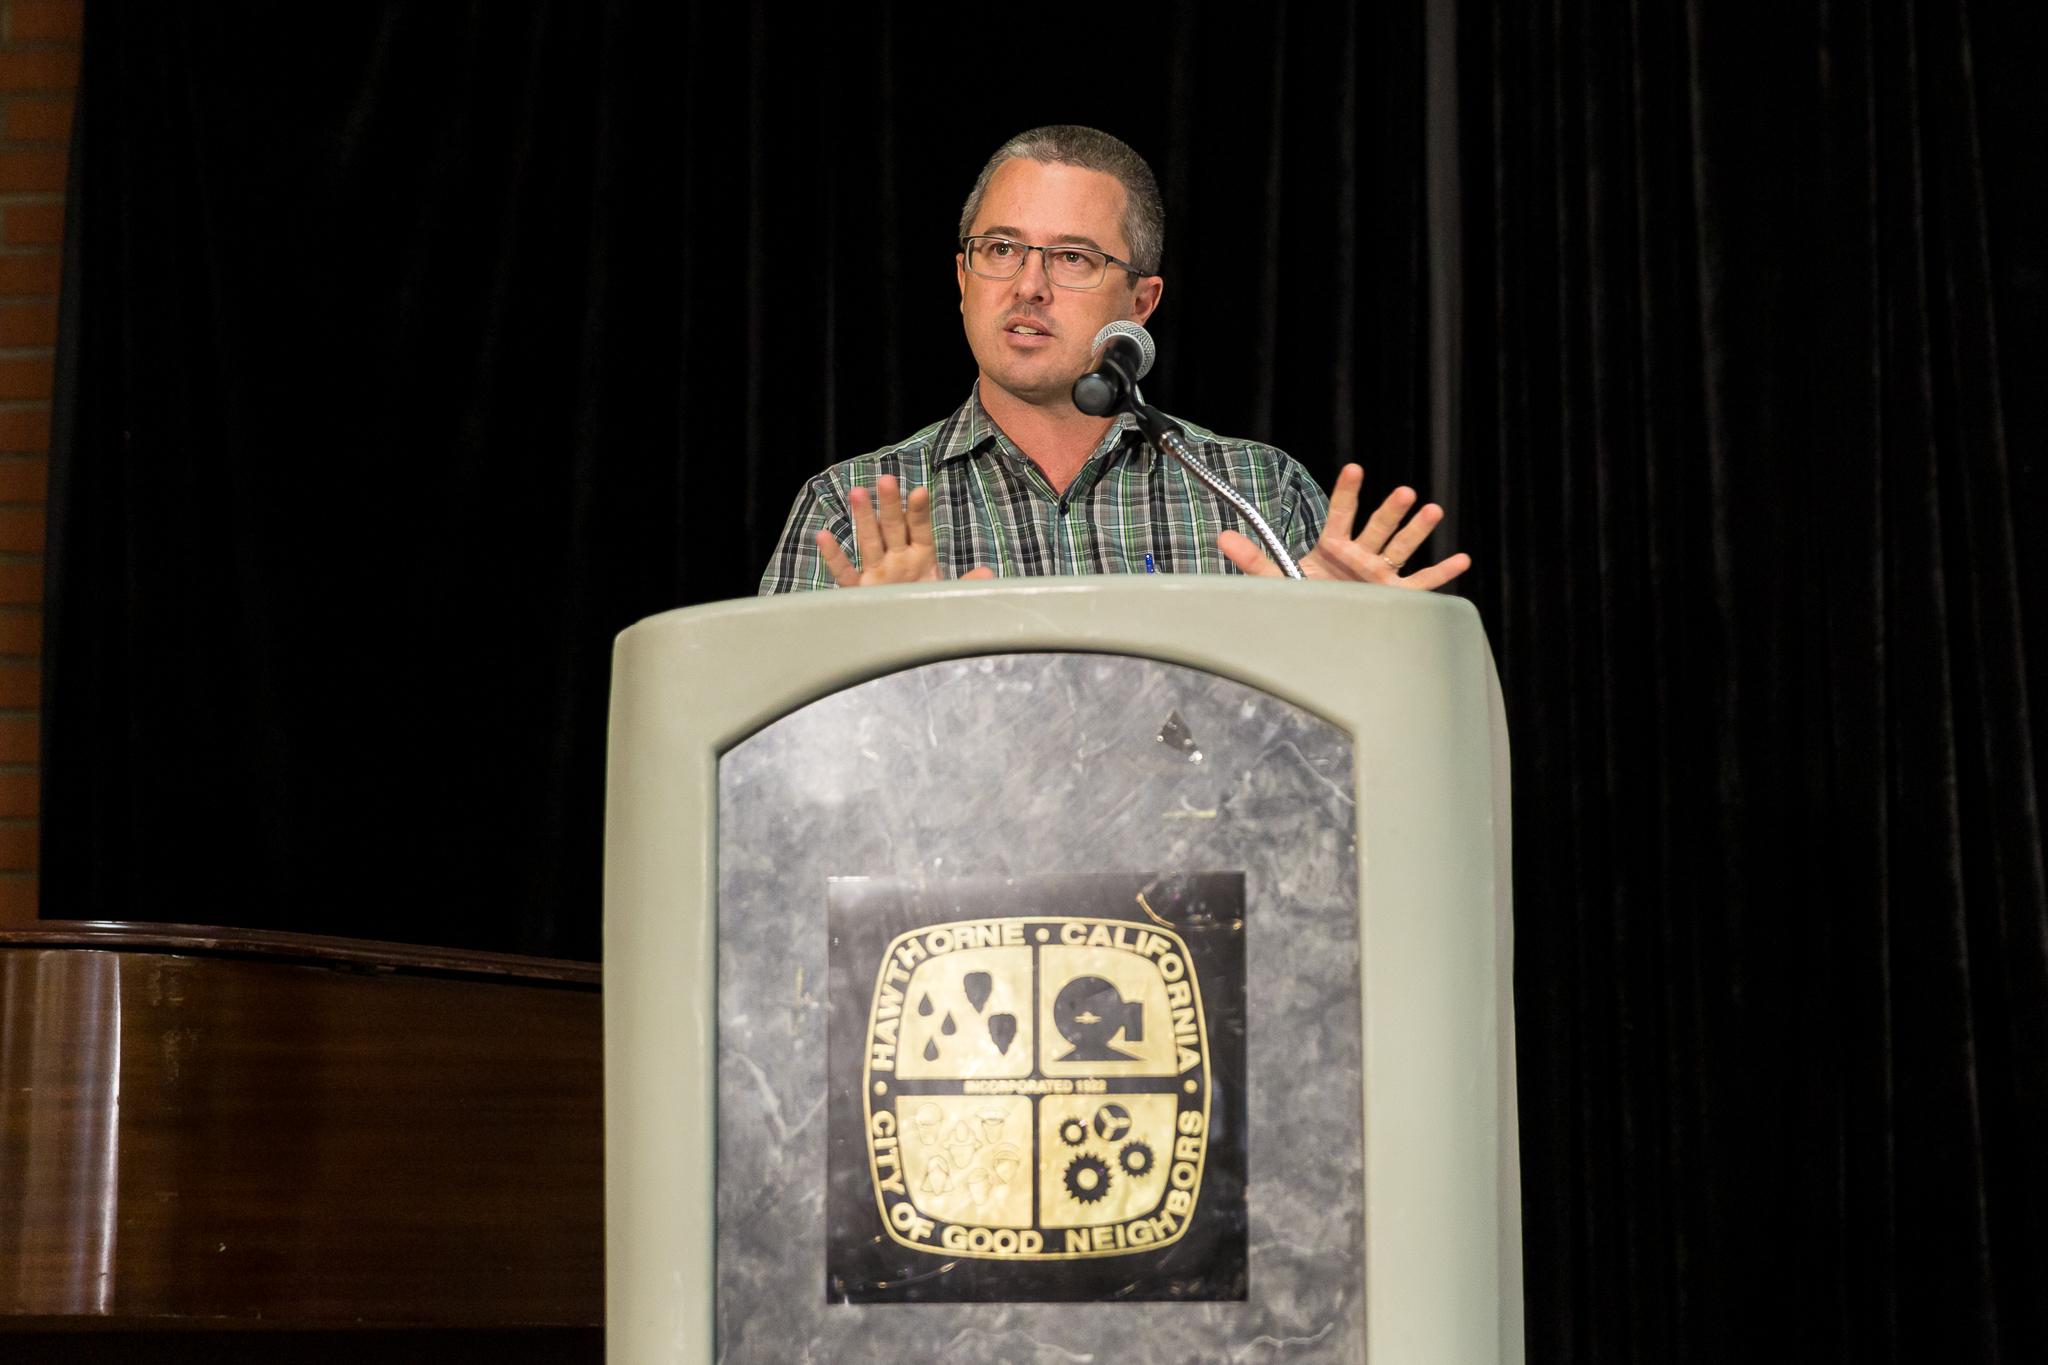 Speaker Doug Krauss